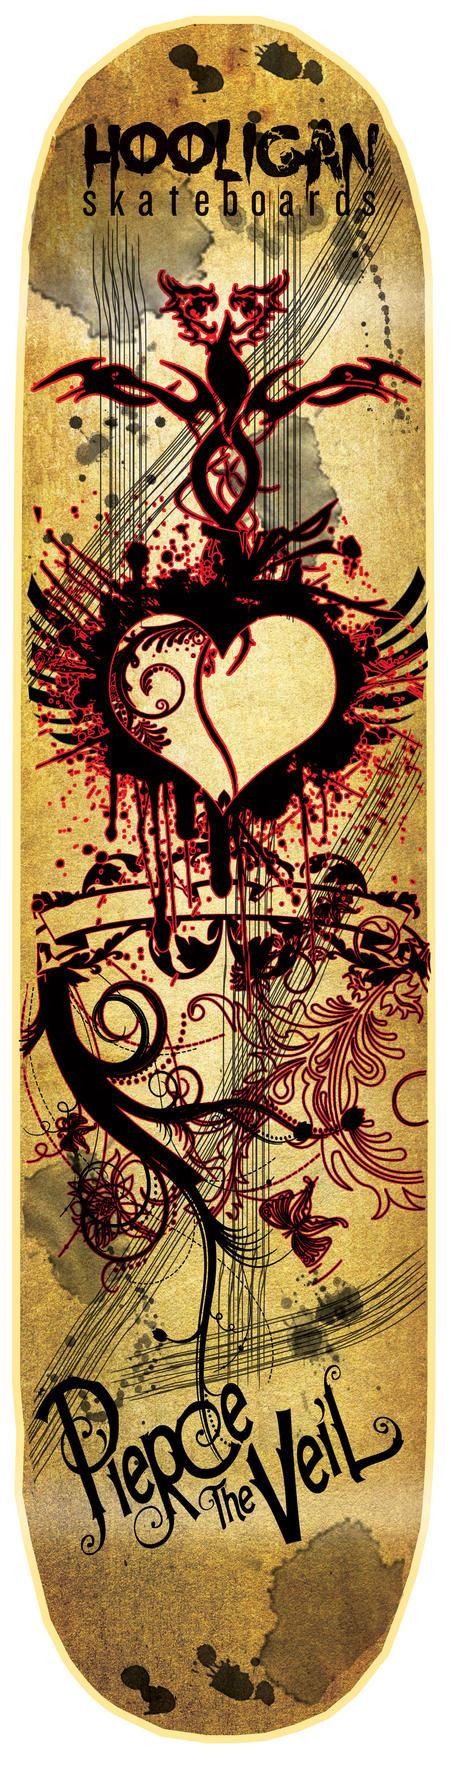 Pierce the Heart by Rainbow-Yuki